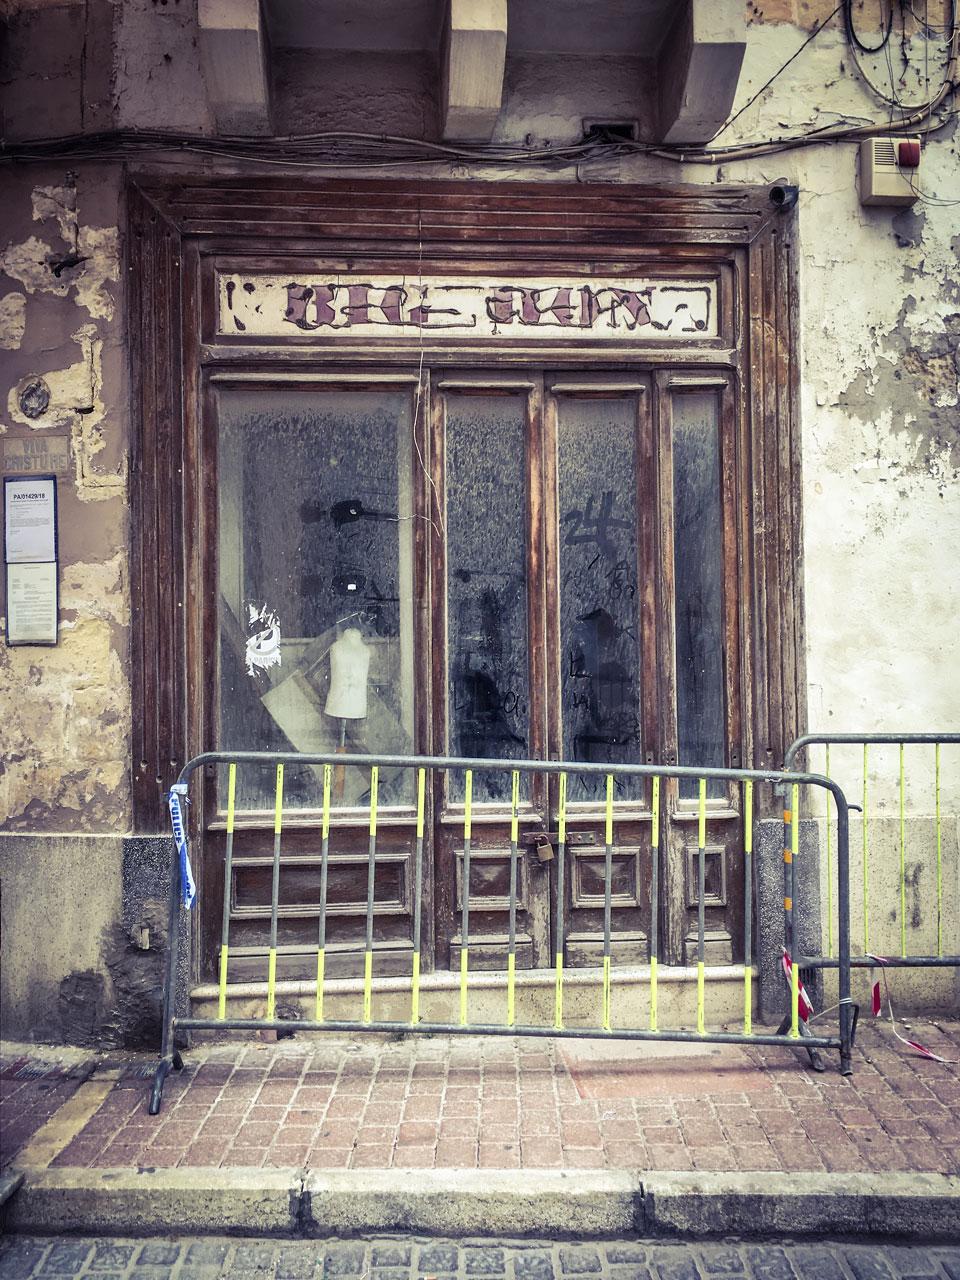 disappearingMalta - BIG GUN vintage storefront, Triq il-Kbira, Birkirkara, Malta - vintage storefront ©Helen Jones-Florio photography prints